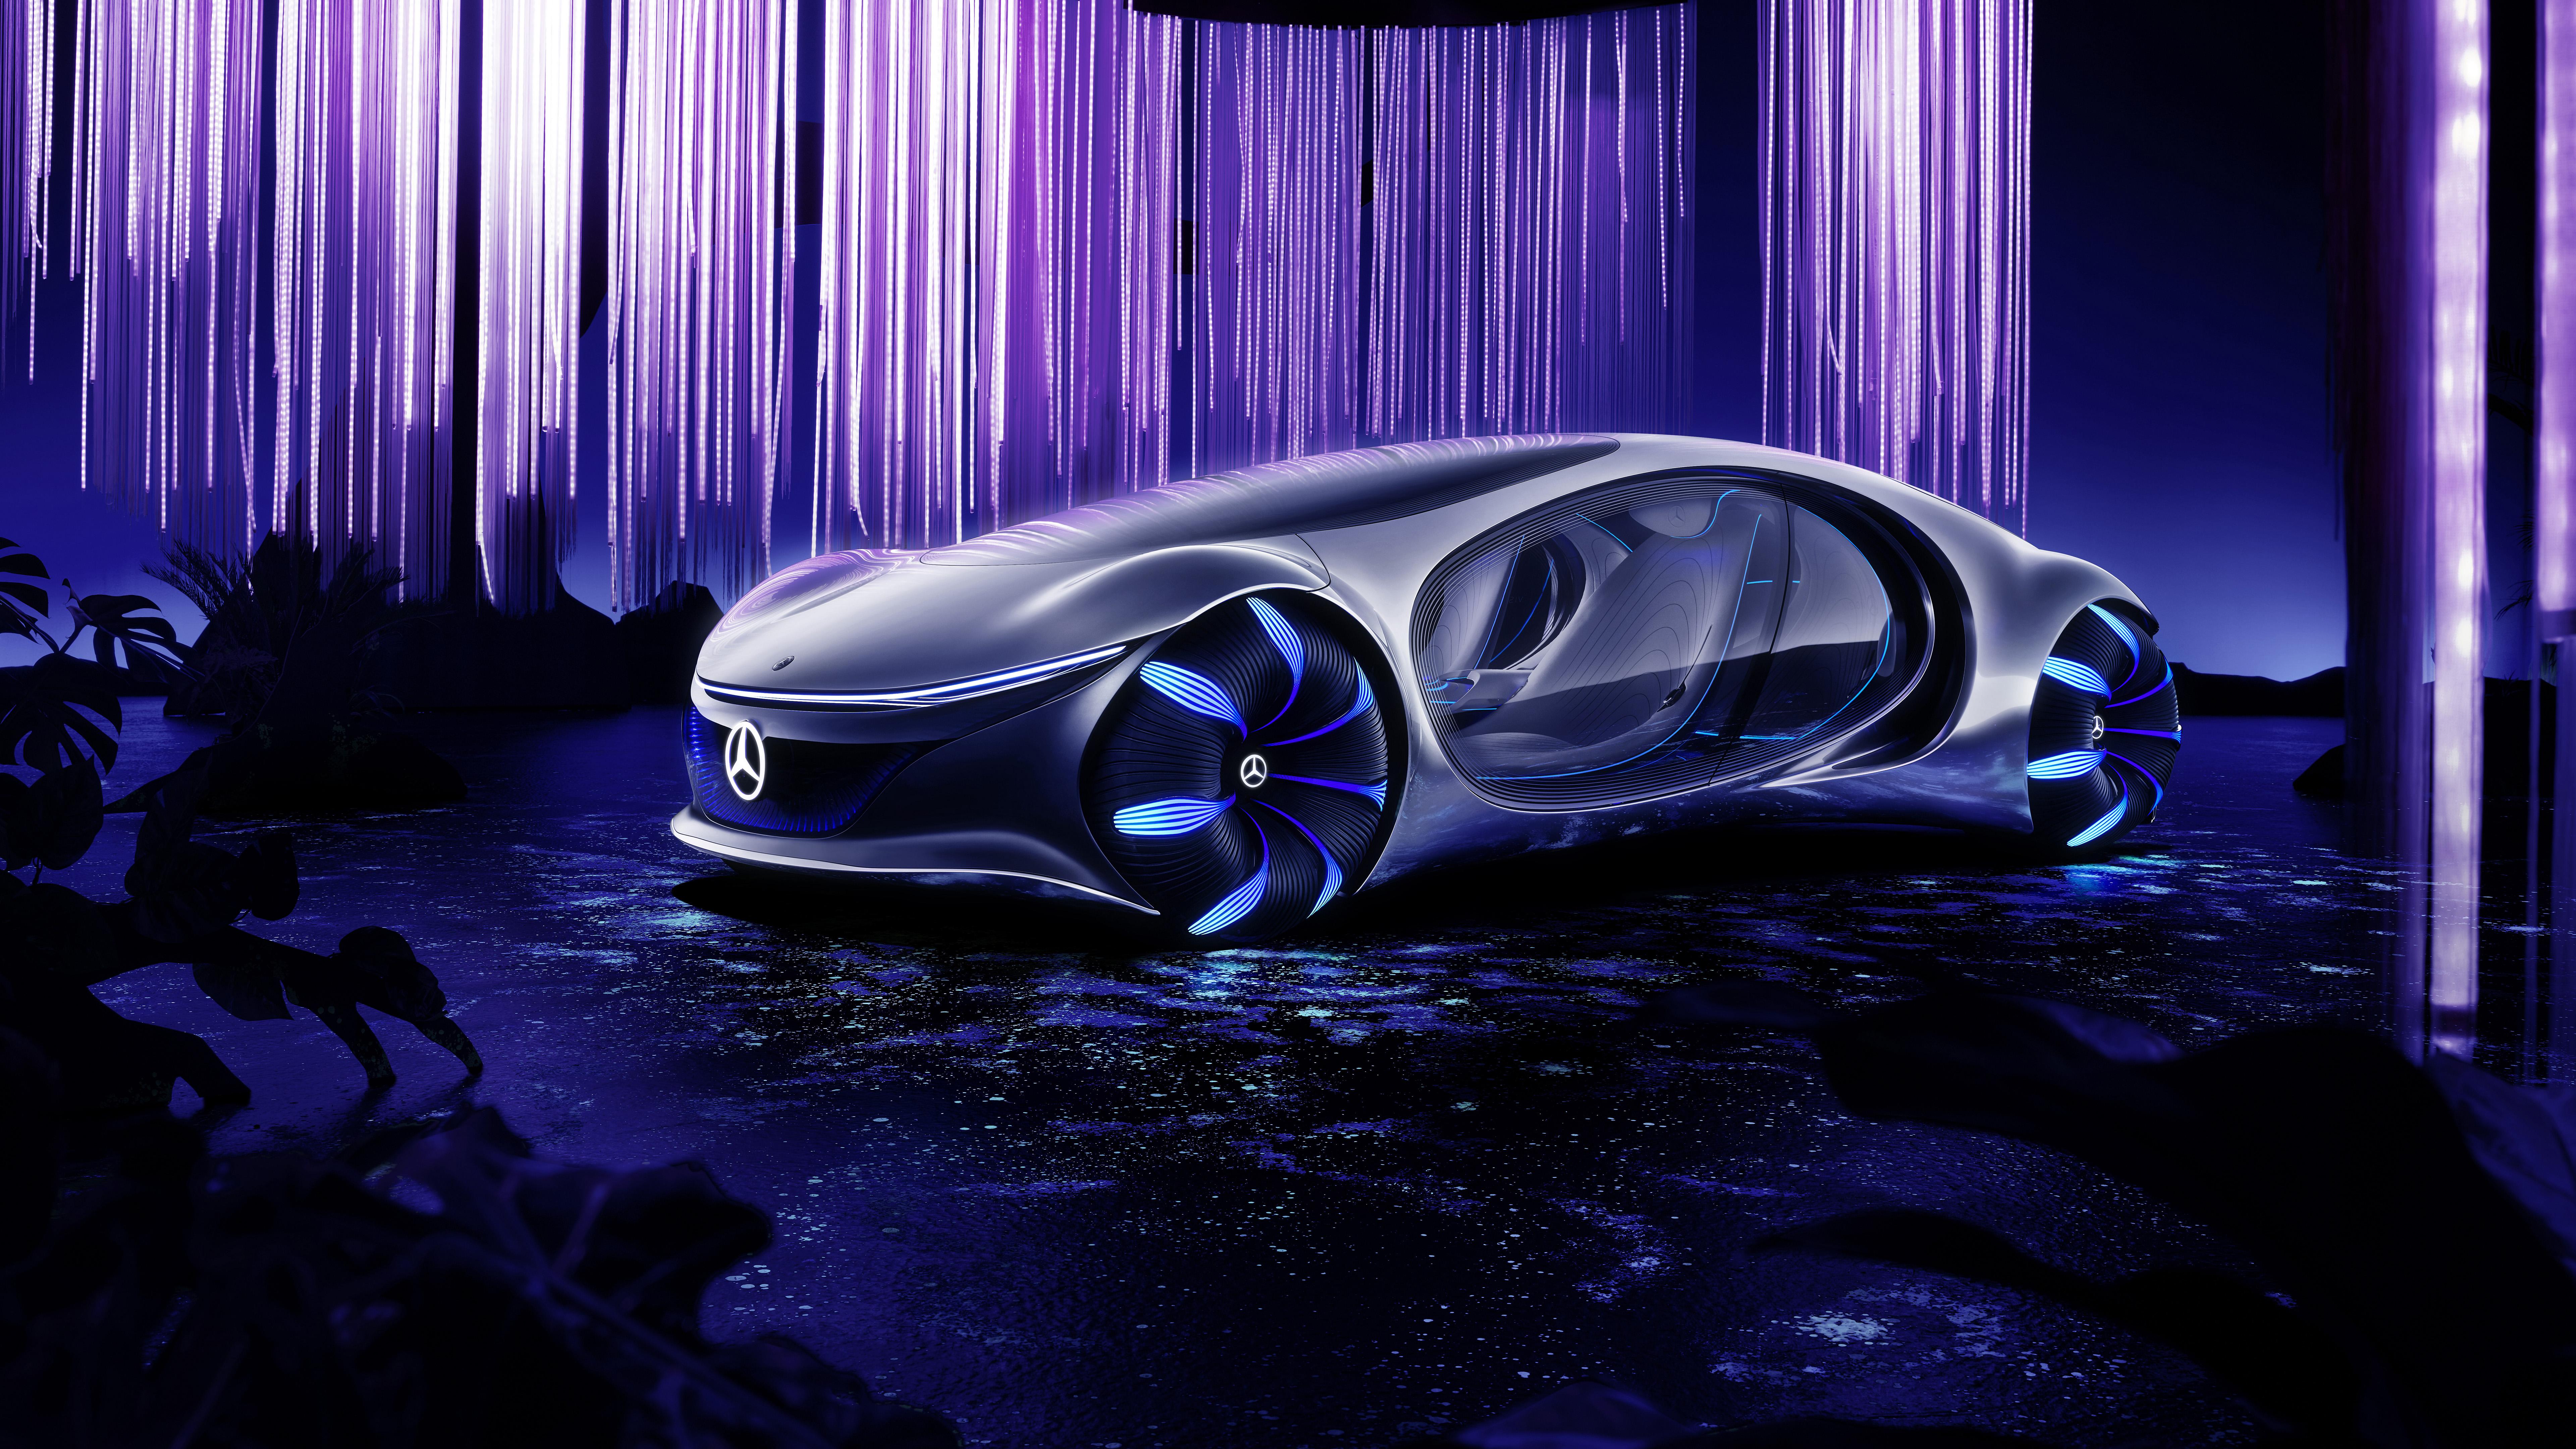 Mercedes Benz VISION AVTR 2020 4K 8K Wallpaper HD Car Wallpapers 7680x4320